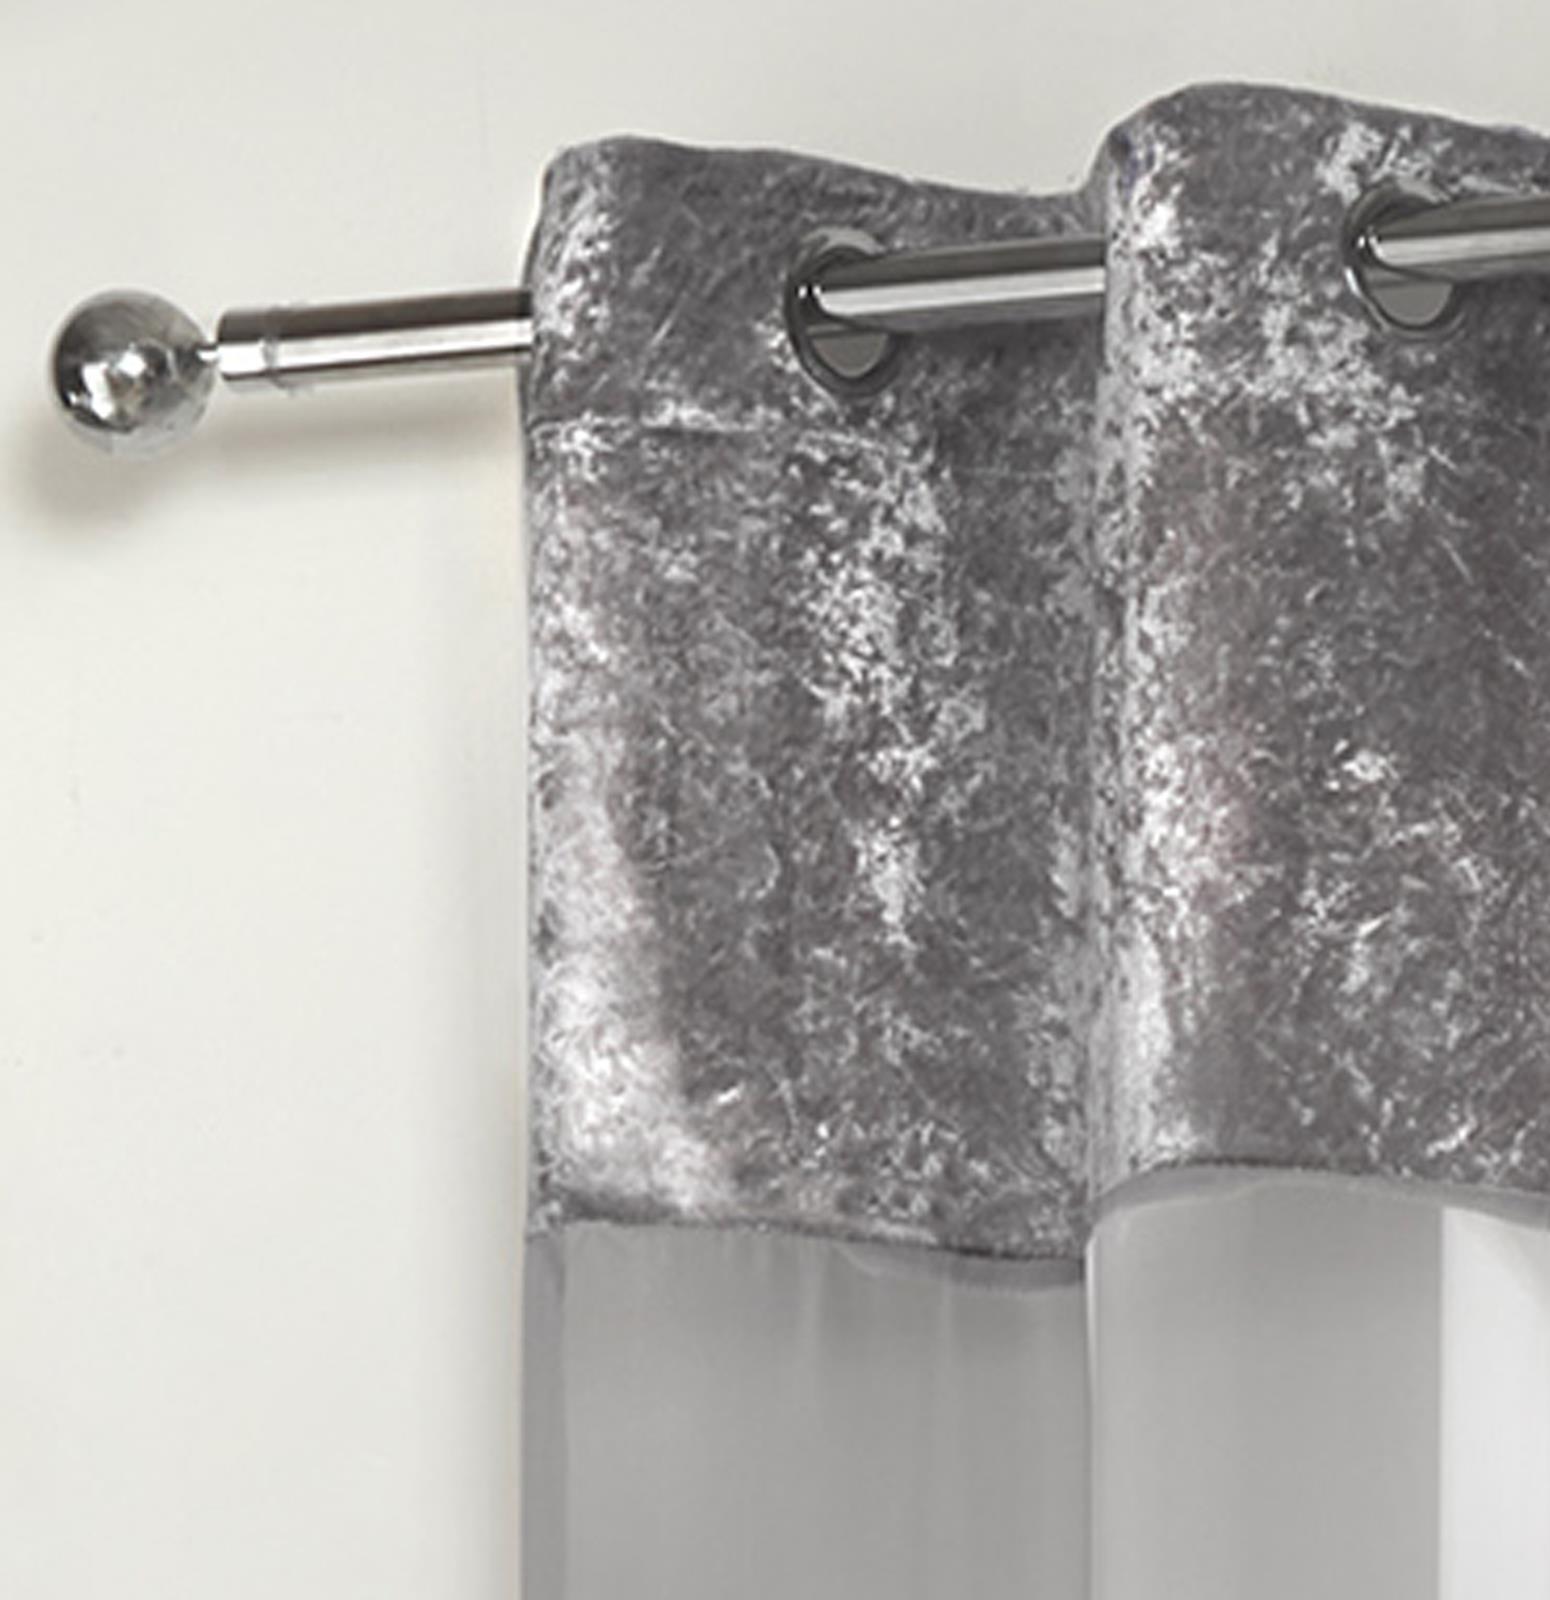 Sienna-Crushed-Velvet-Voile-PAIR-of-Net-Eyelet-Ring-Top-Curtains-Blush-Silver thumbnail 19